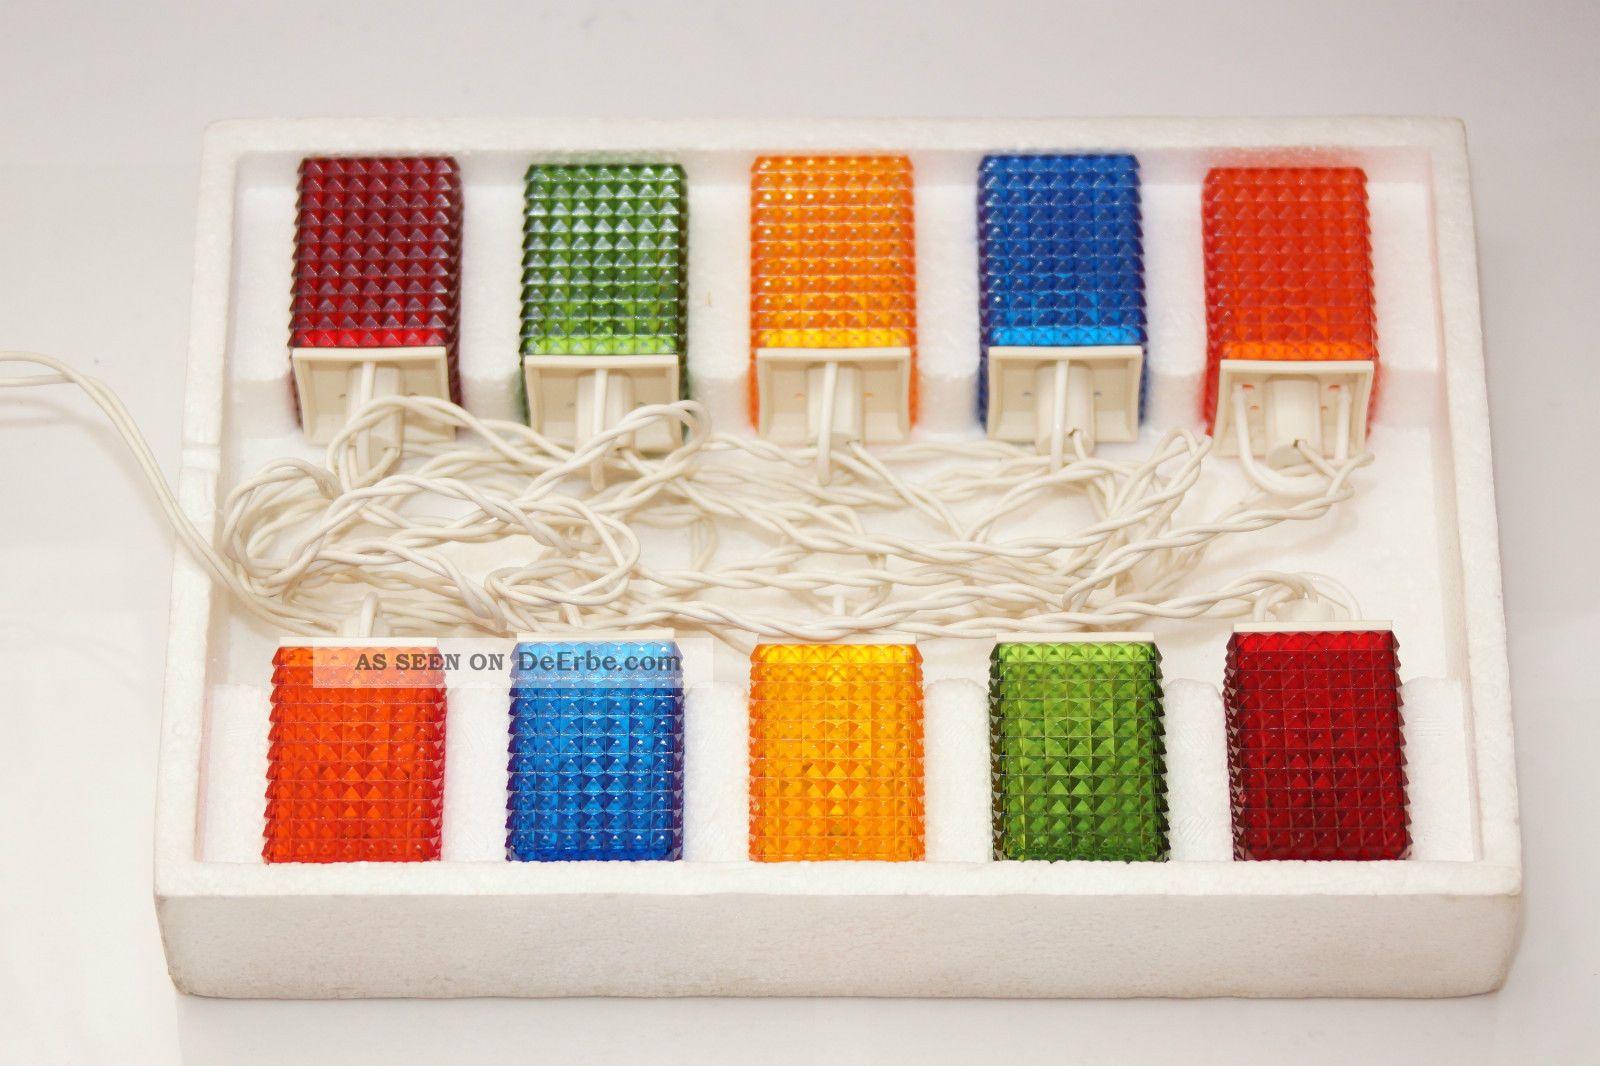 70er jahre party lichterkette lampions partylichter 10. Black Bedroom Furniture Sets. Home Design Ideas